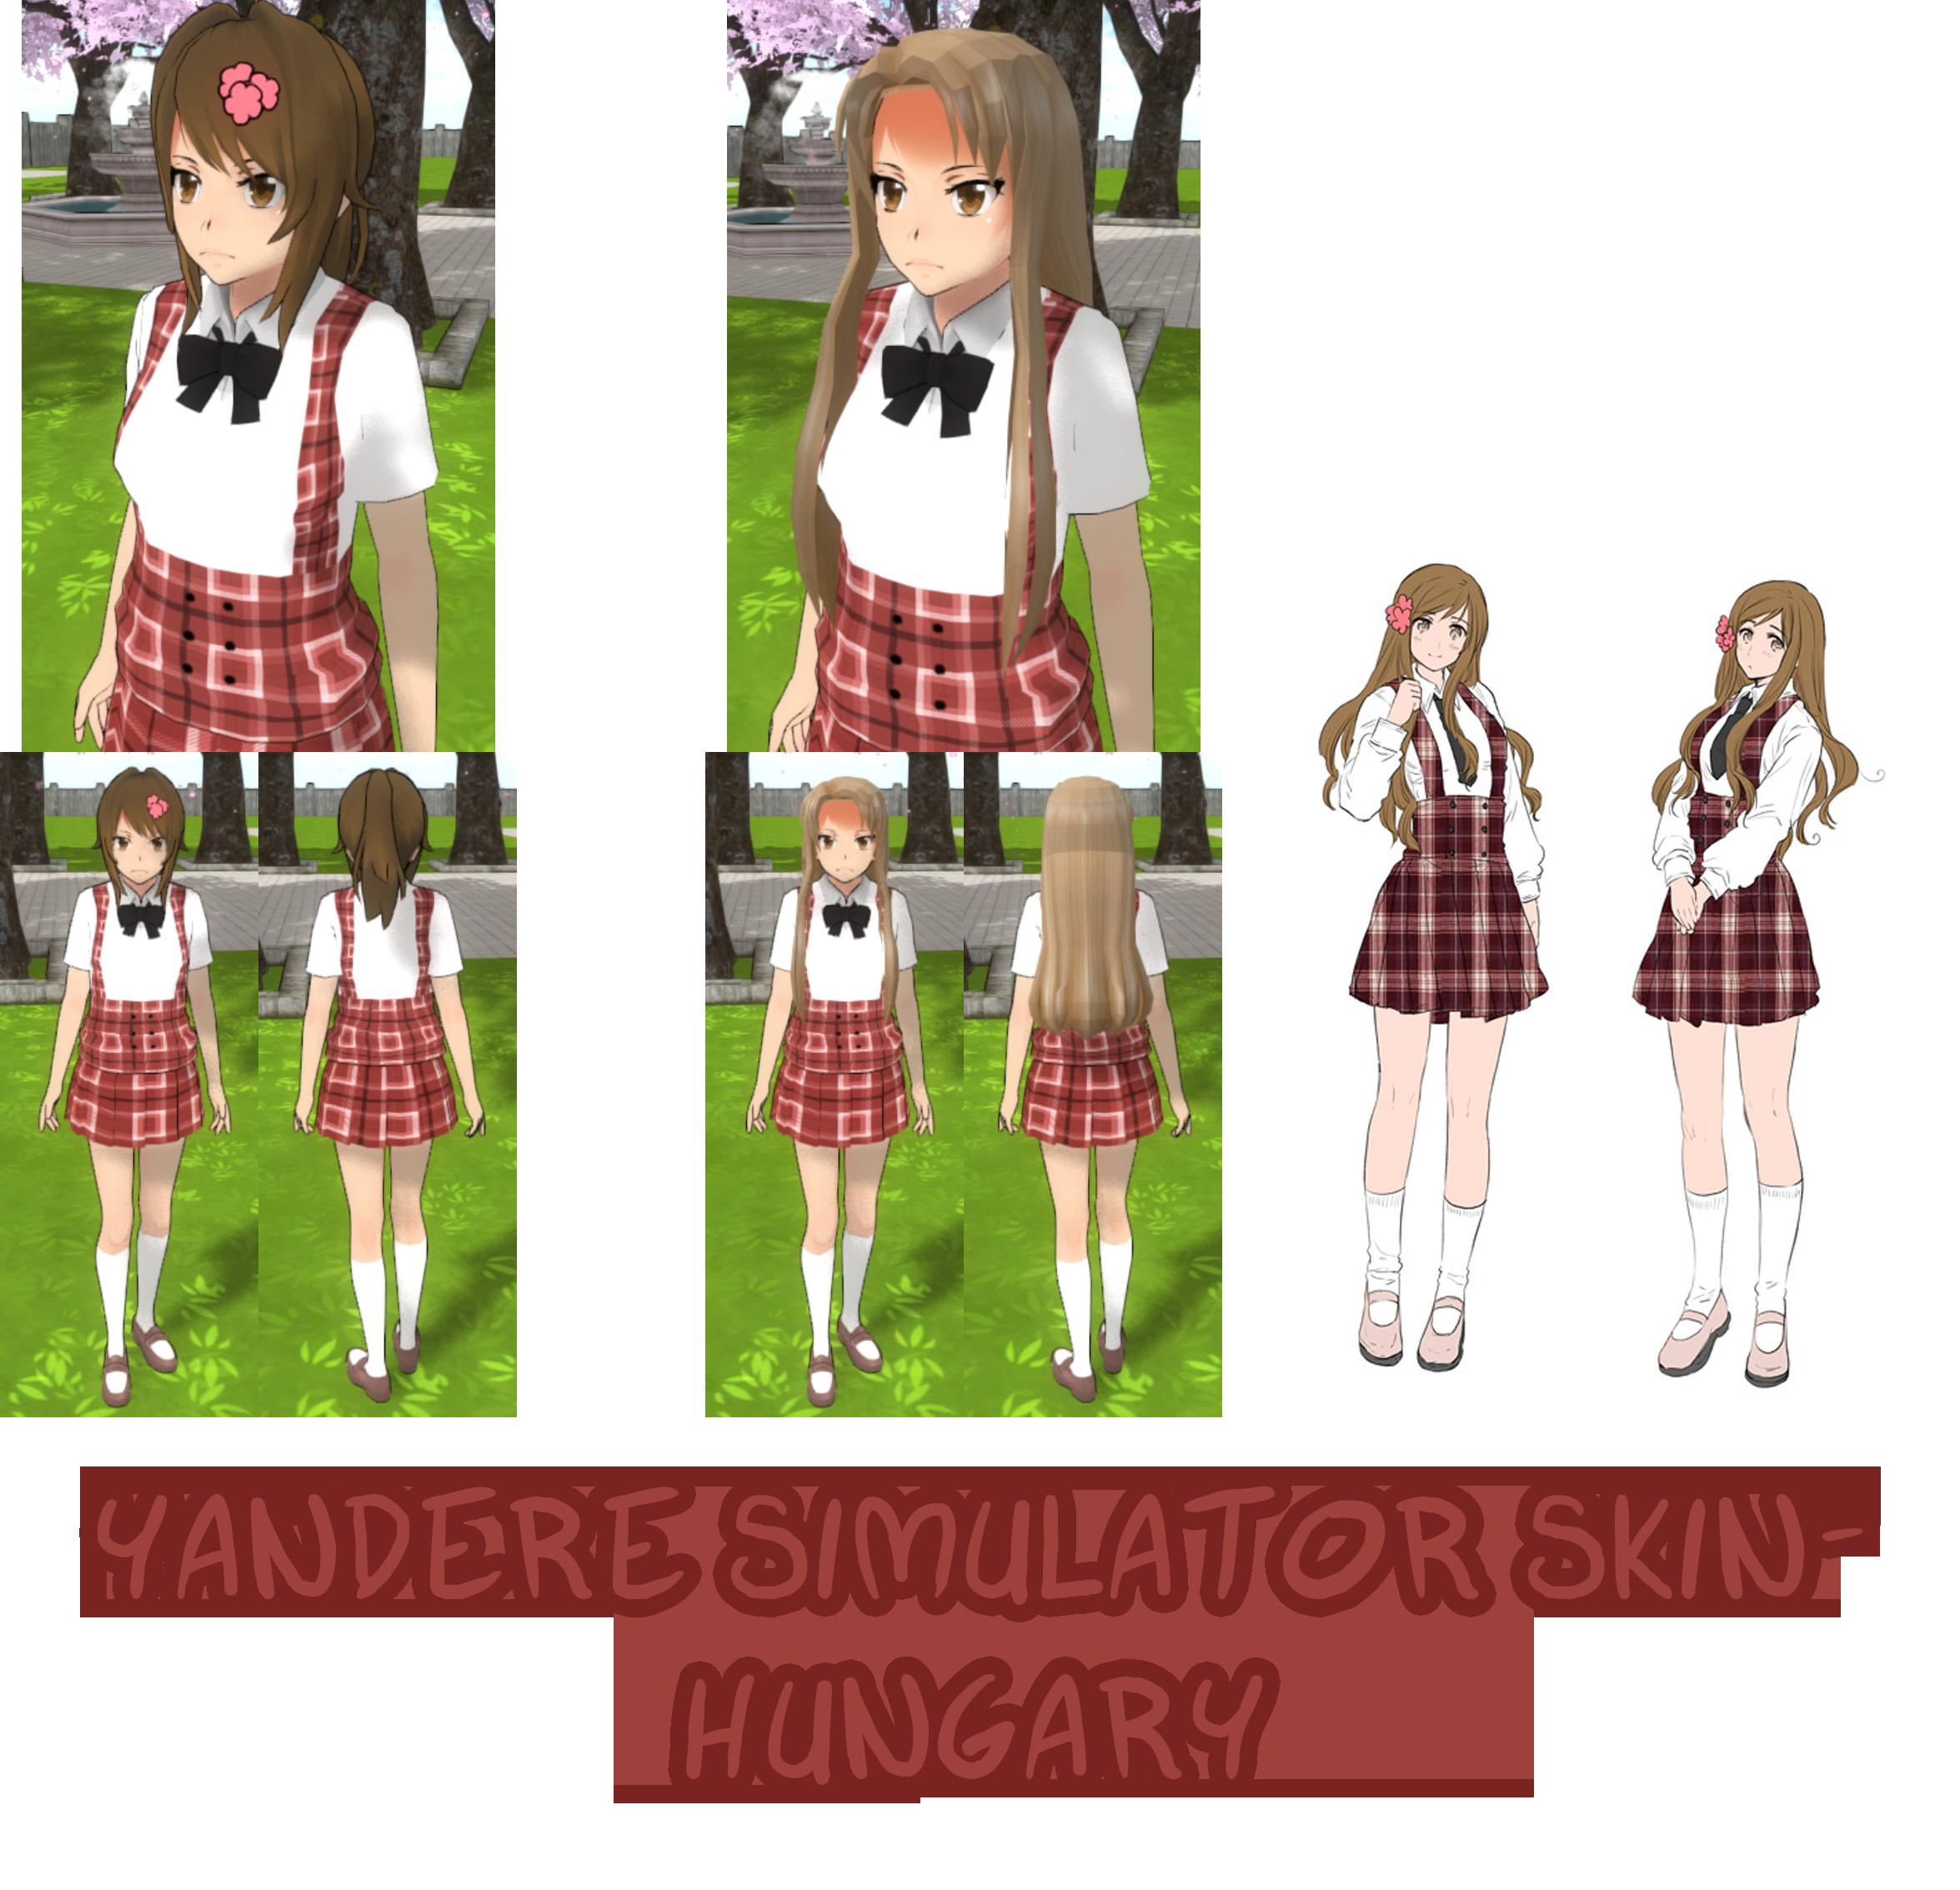 Yandere simulator chara skin by imaginaryalchemist on deviantart.